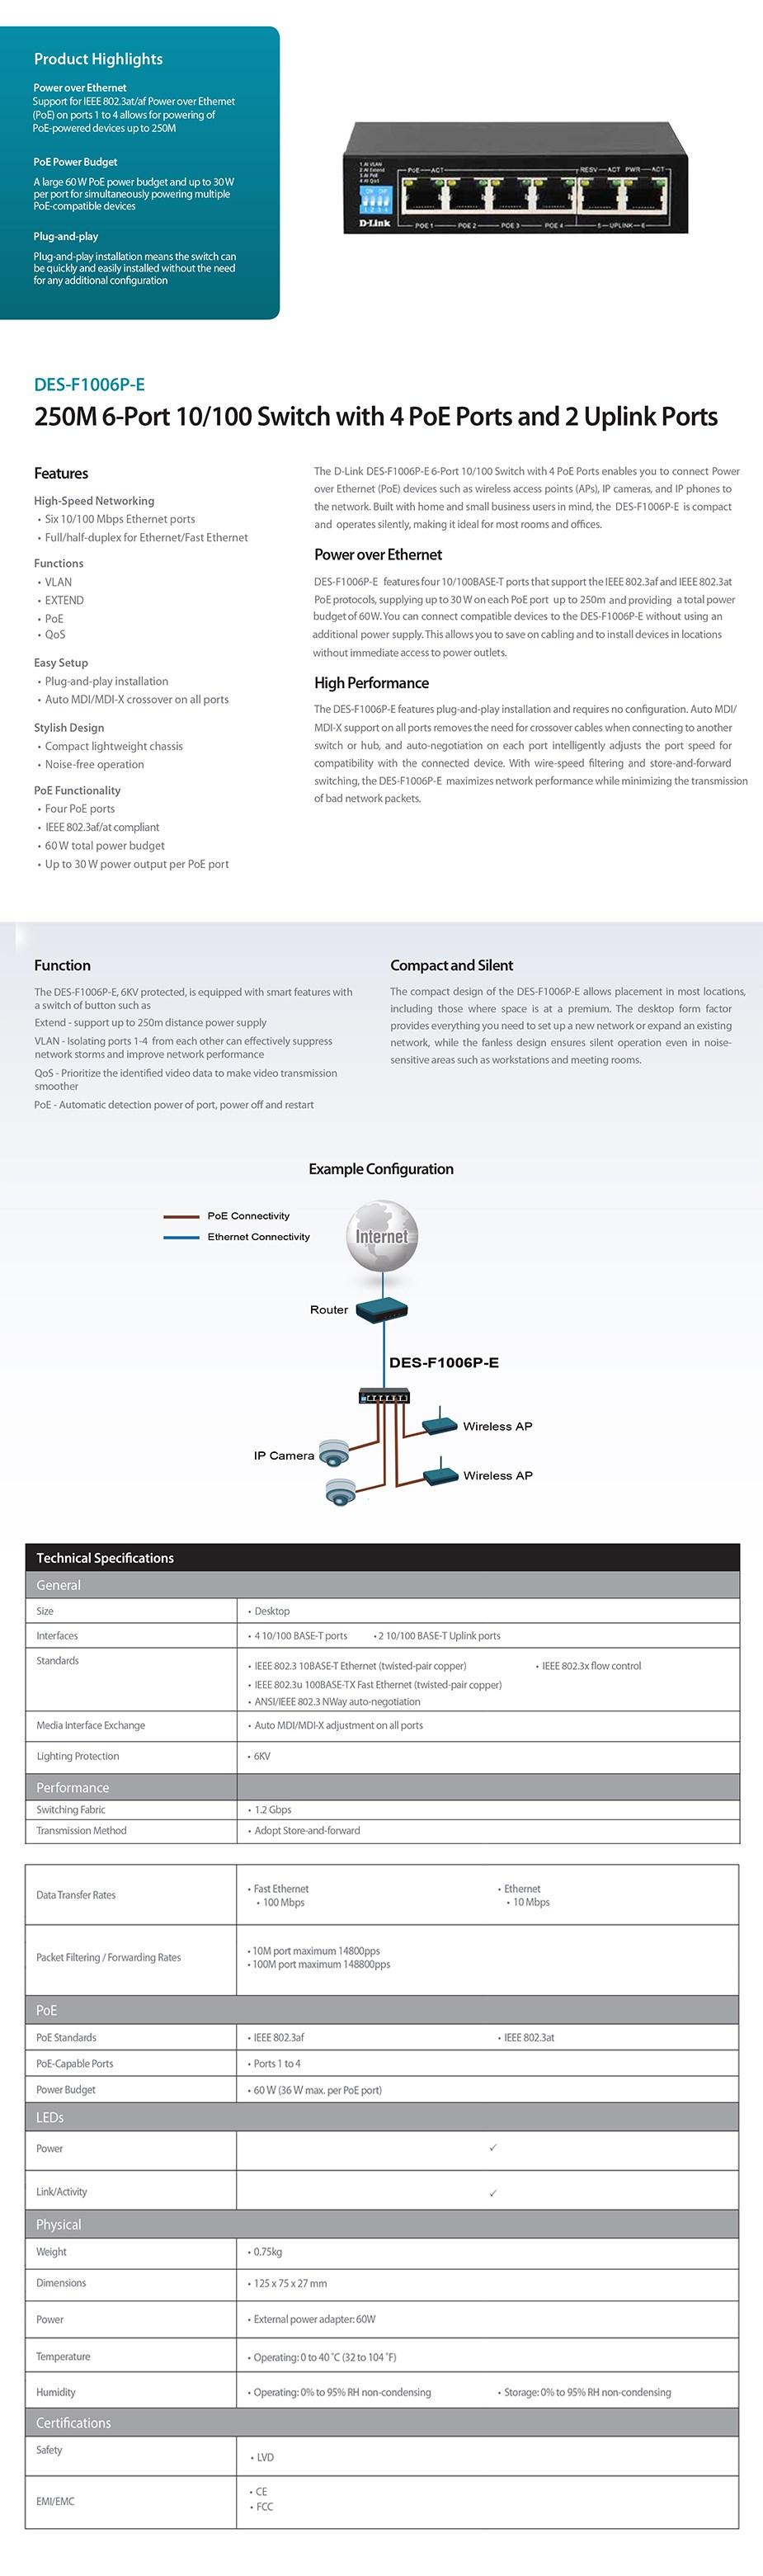 dlink-desf1006pe-250m-6port-1010-switch-with-4-poe-ports2-uplink-ports-ac34247-3.jpg